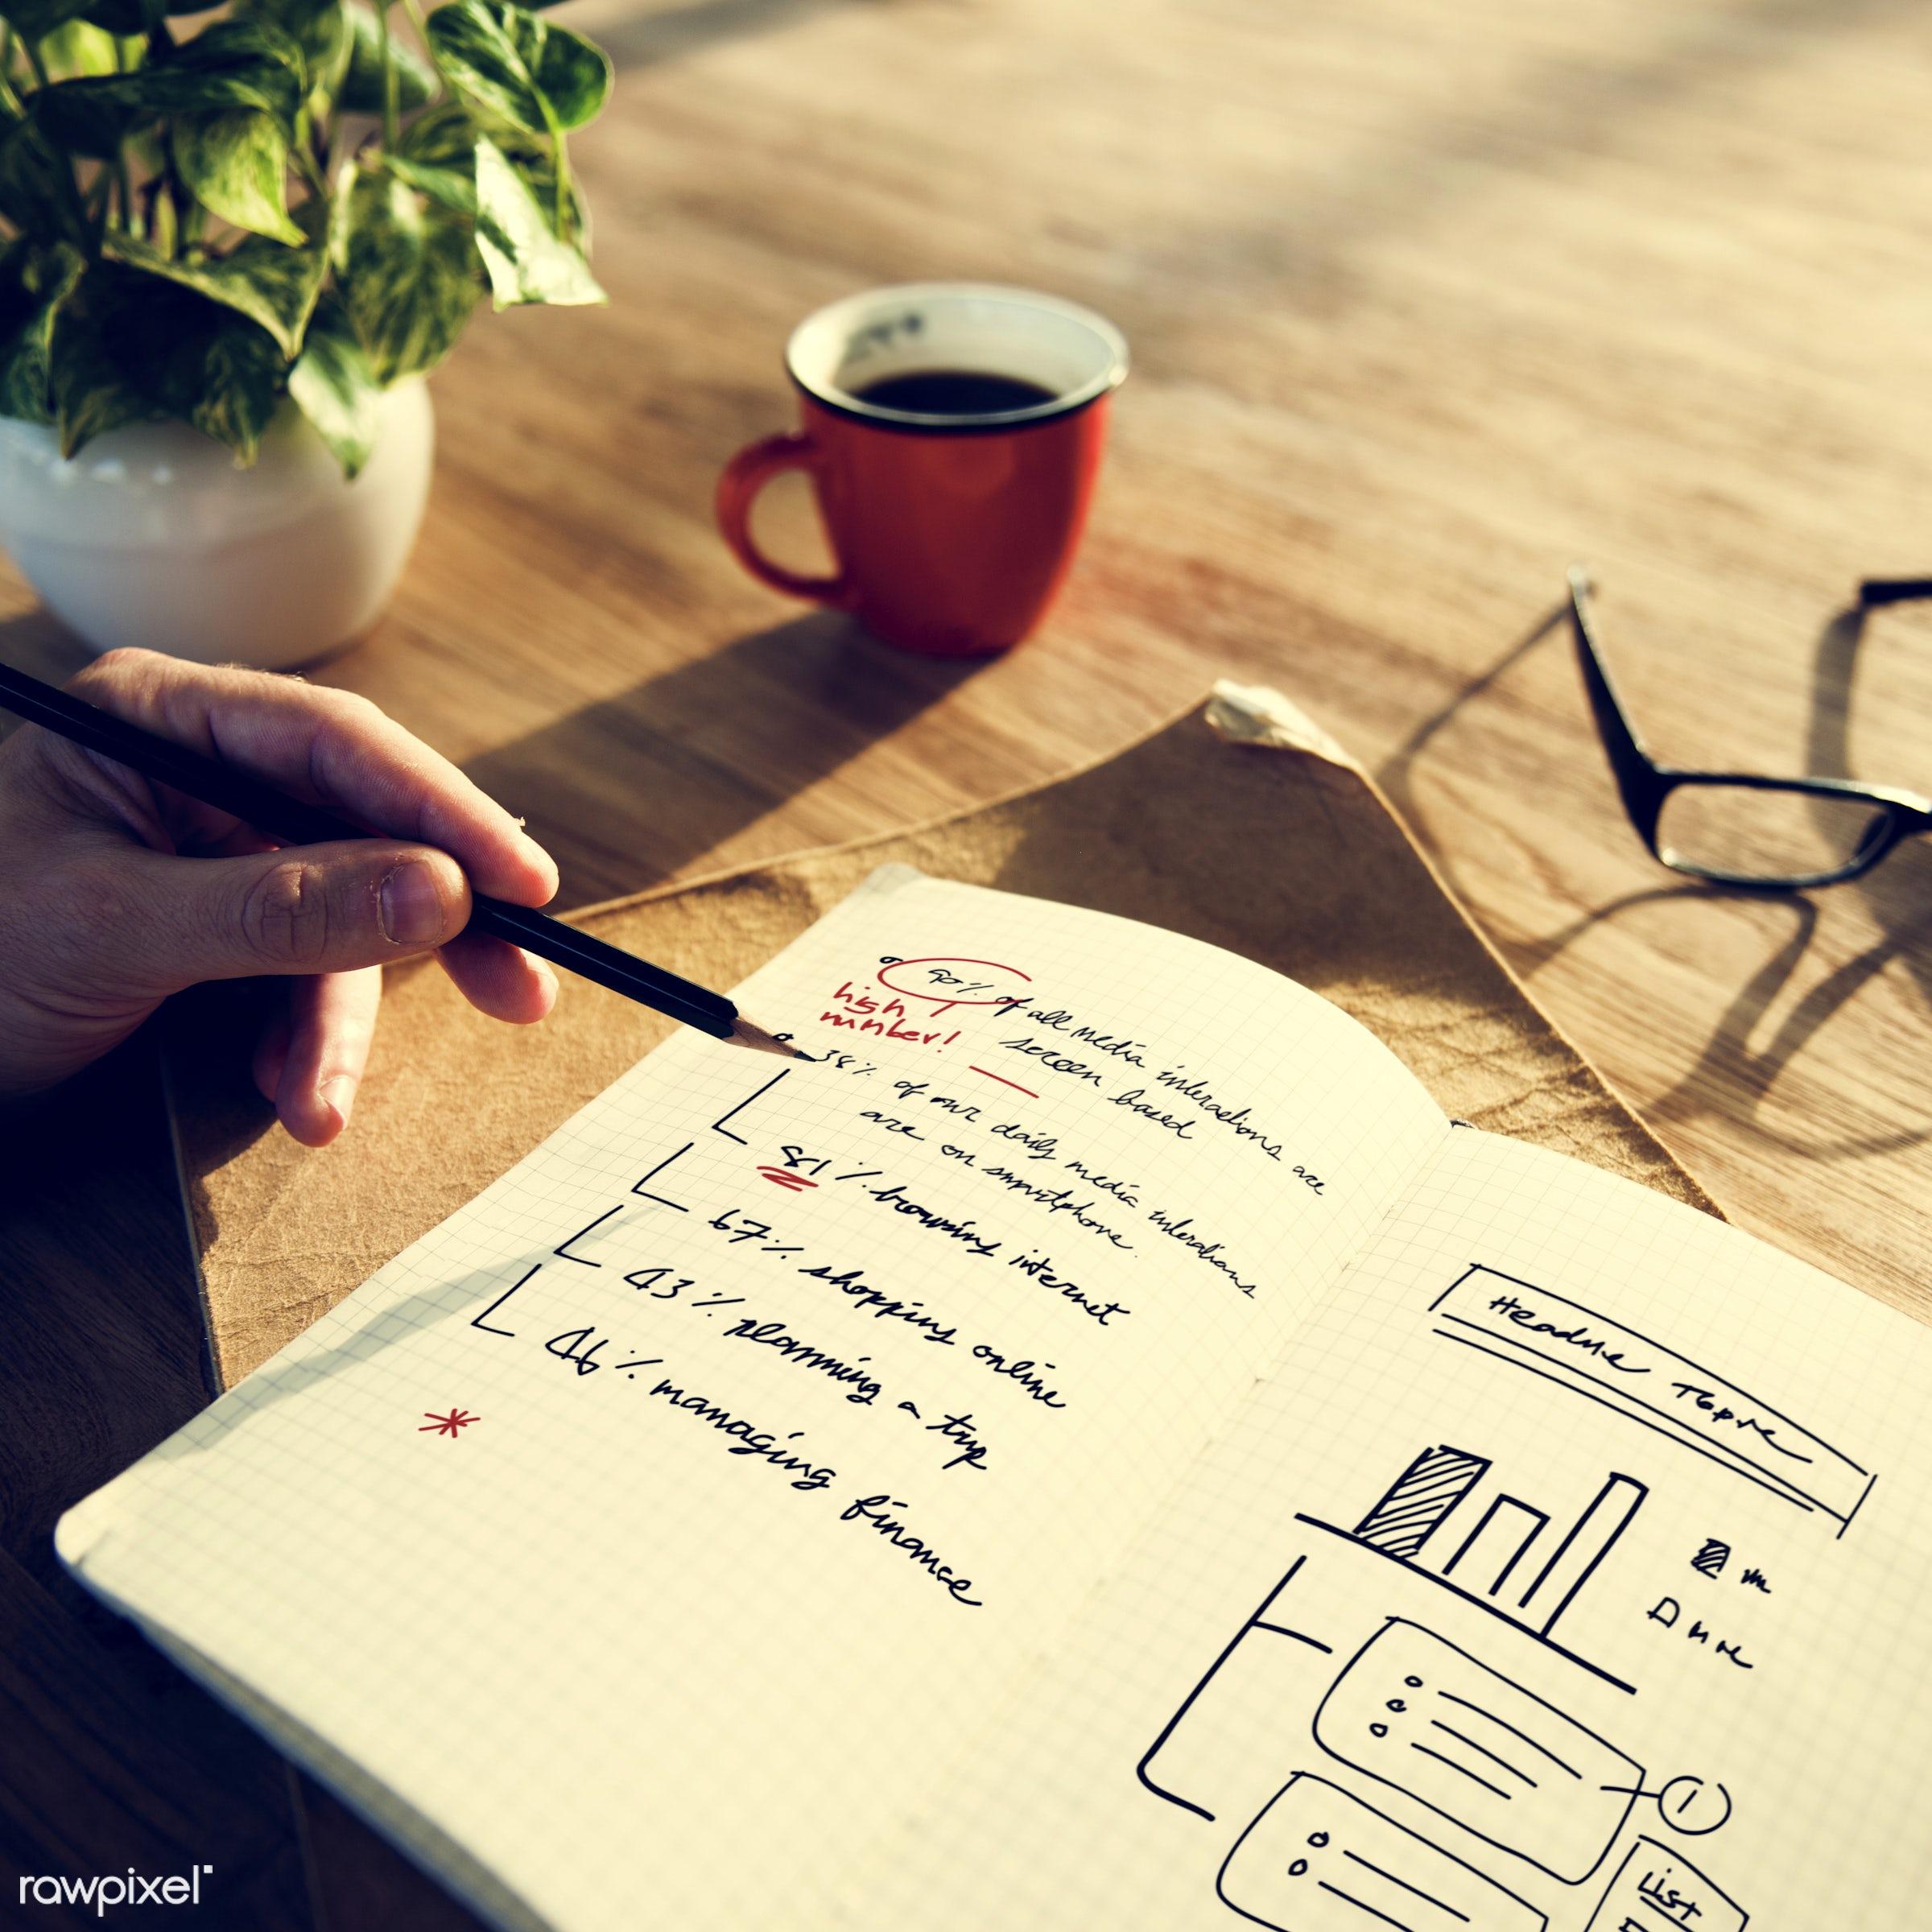 book, business, business plan, coffee, development, drinks, glasses, graph, growth, hand, human hand, improvement, marketing...